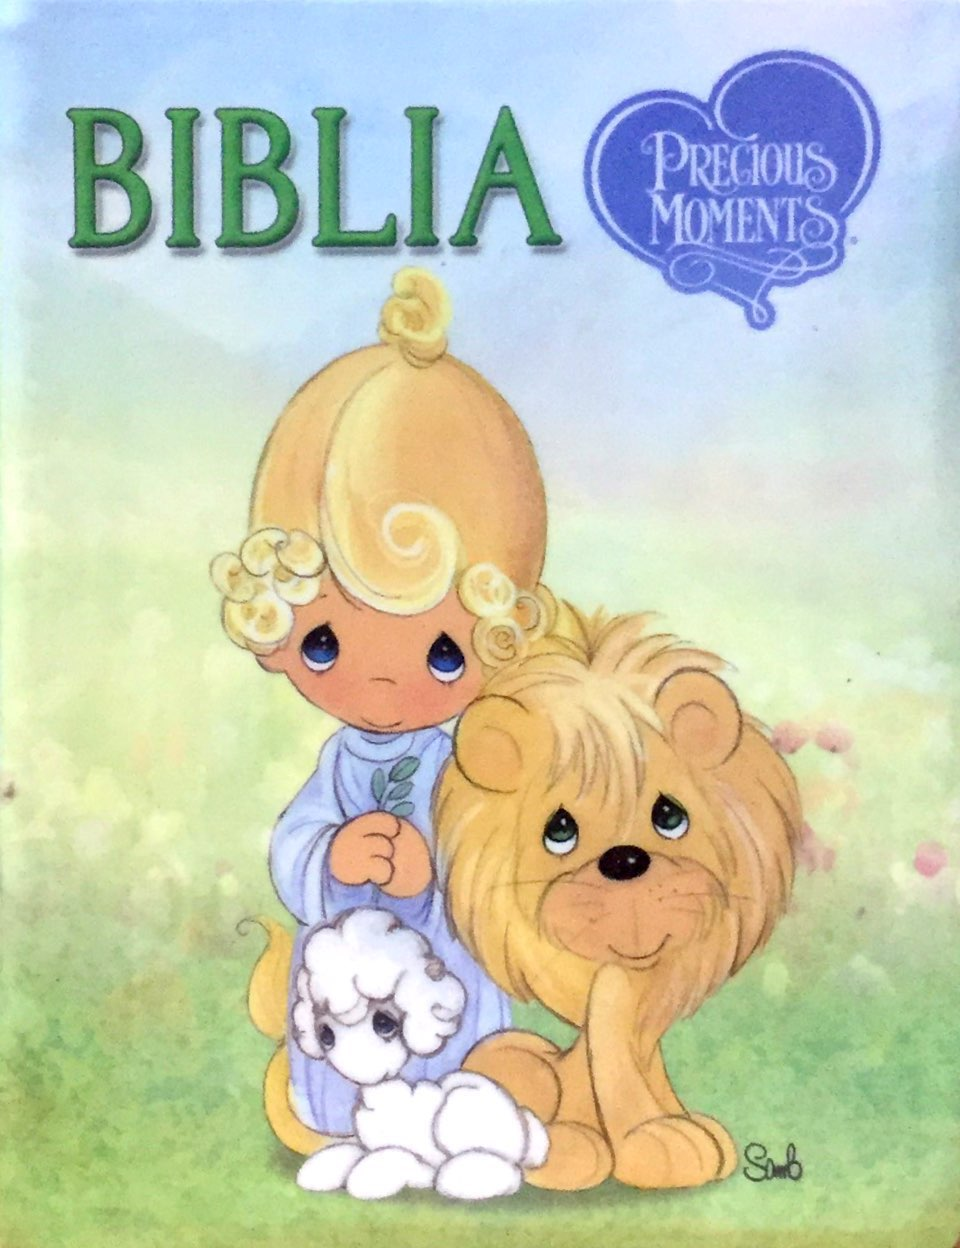 Biblia Precious Moments / Reina Valera 1960 / tama�o bolsillo / tapa vinil de Life Gift Group